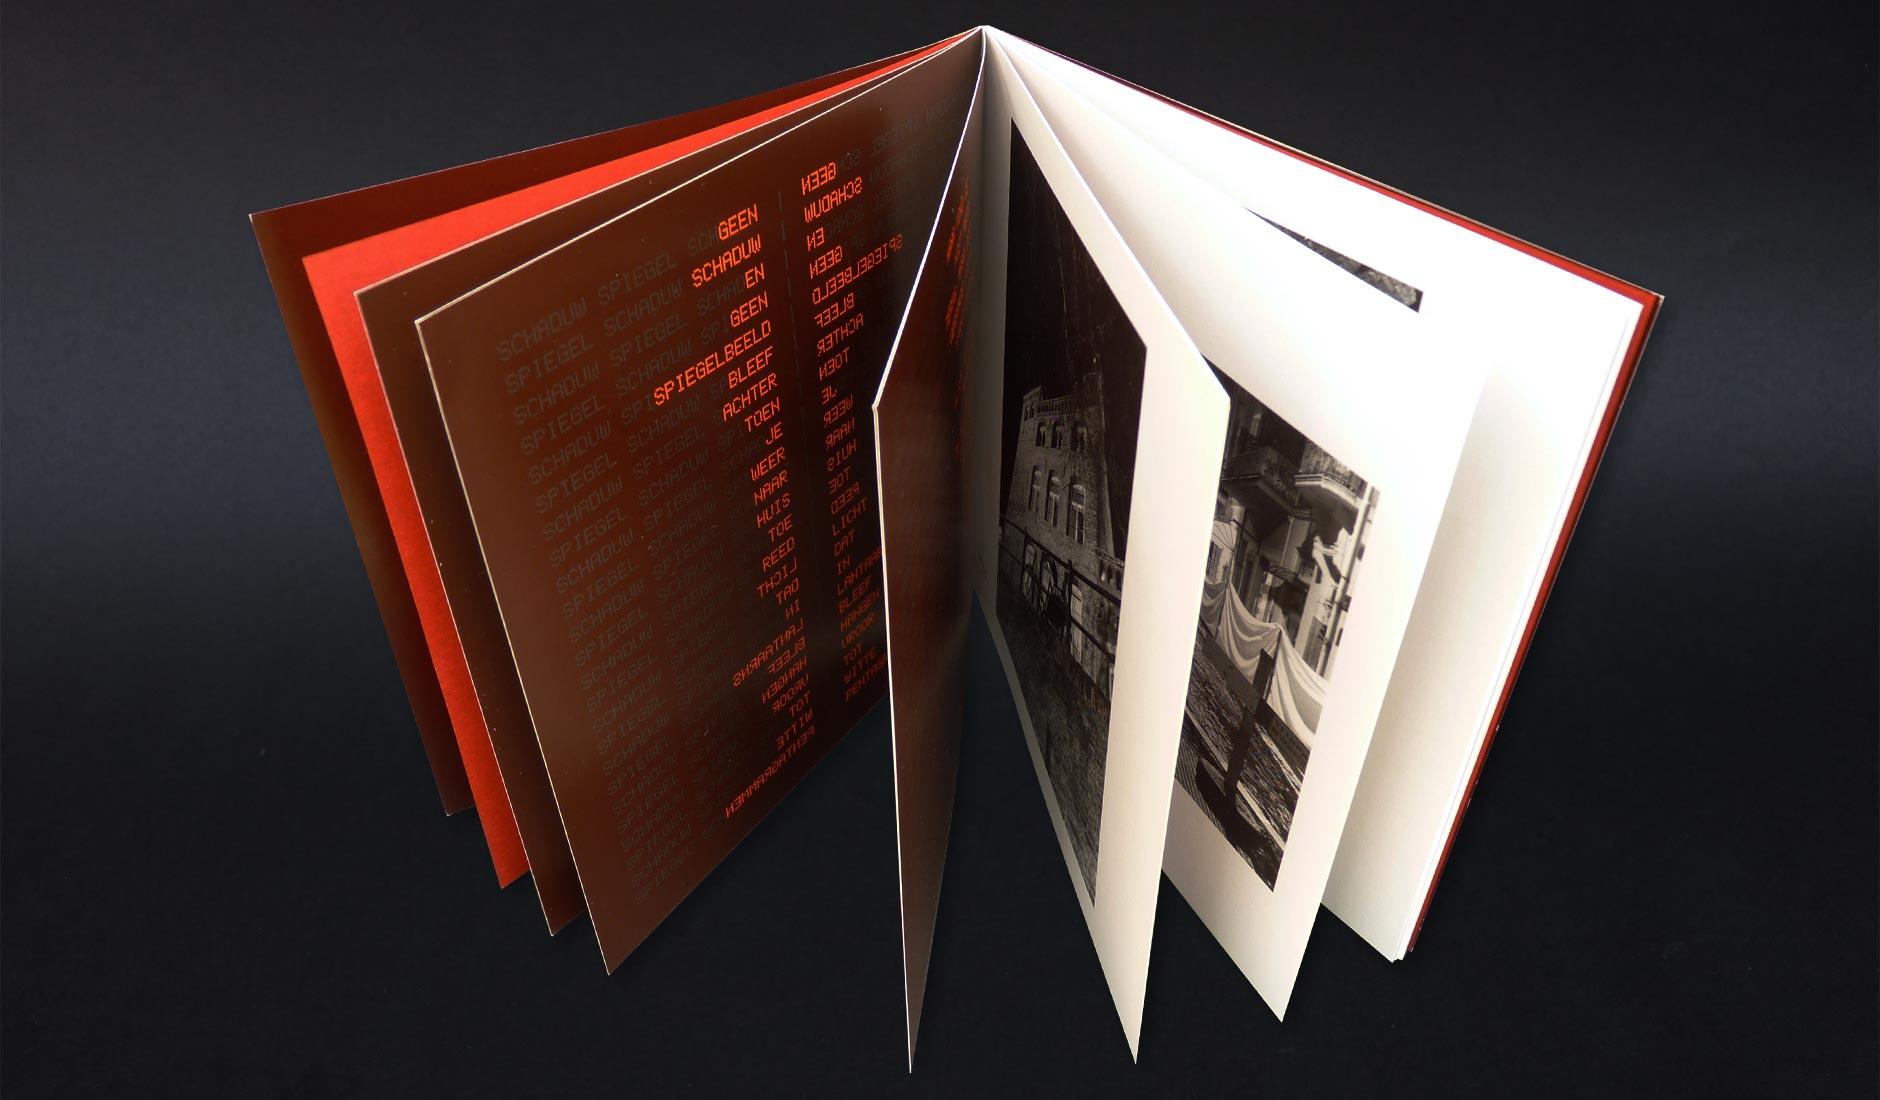 Mooi totaalbeeld van het boek 'Tot nader order geen sterrenhemel' met open waaierende pagina's.